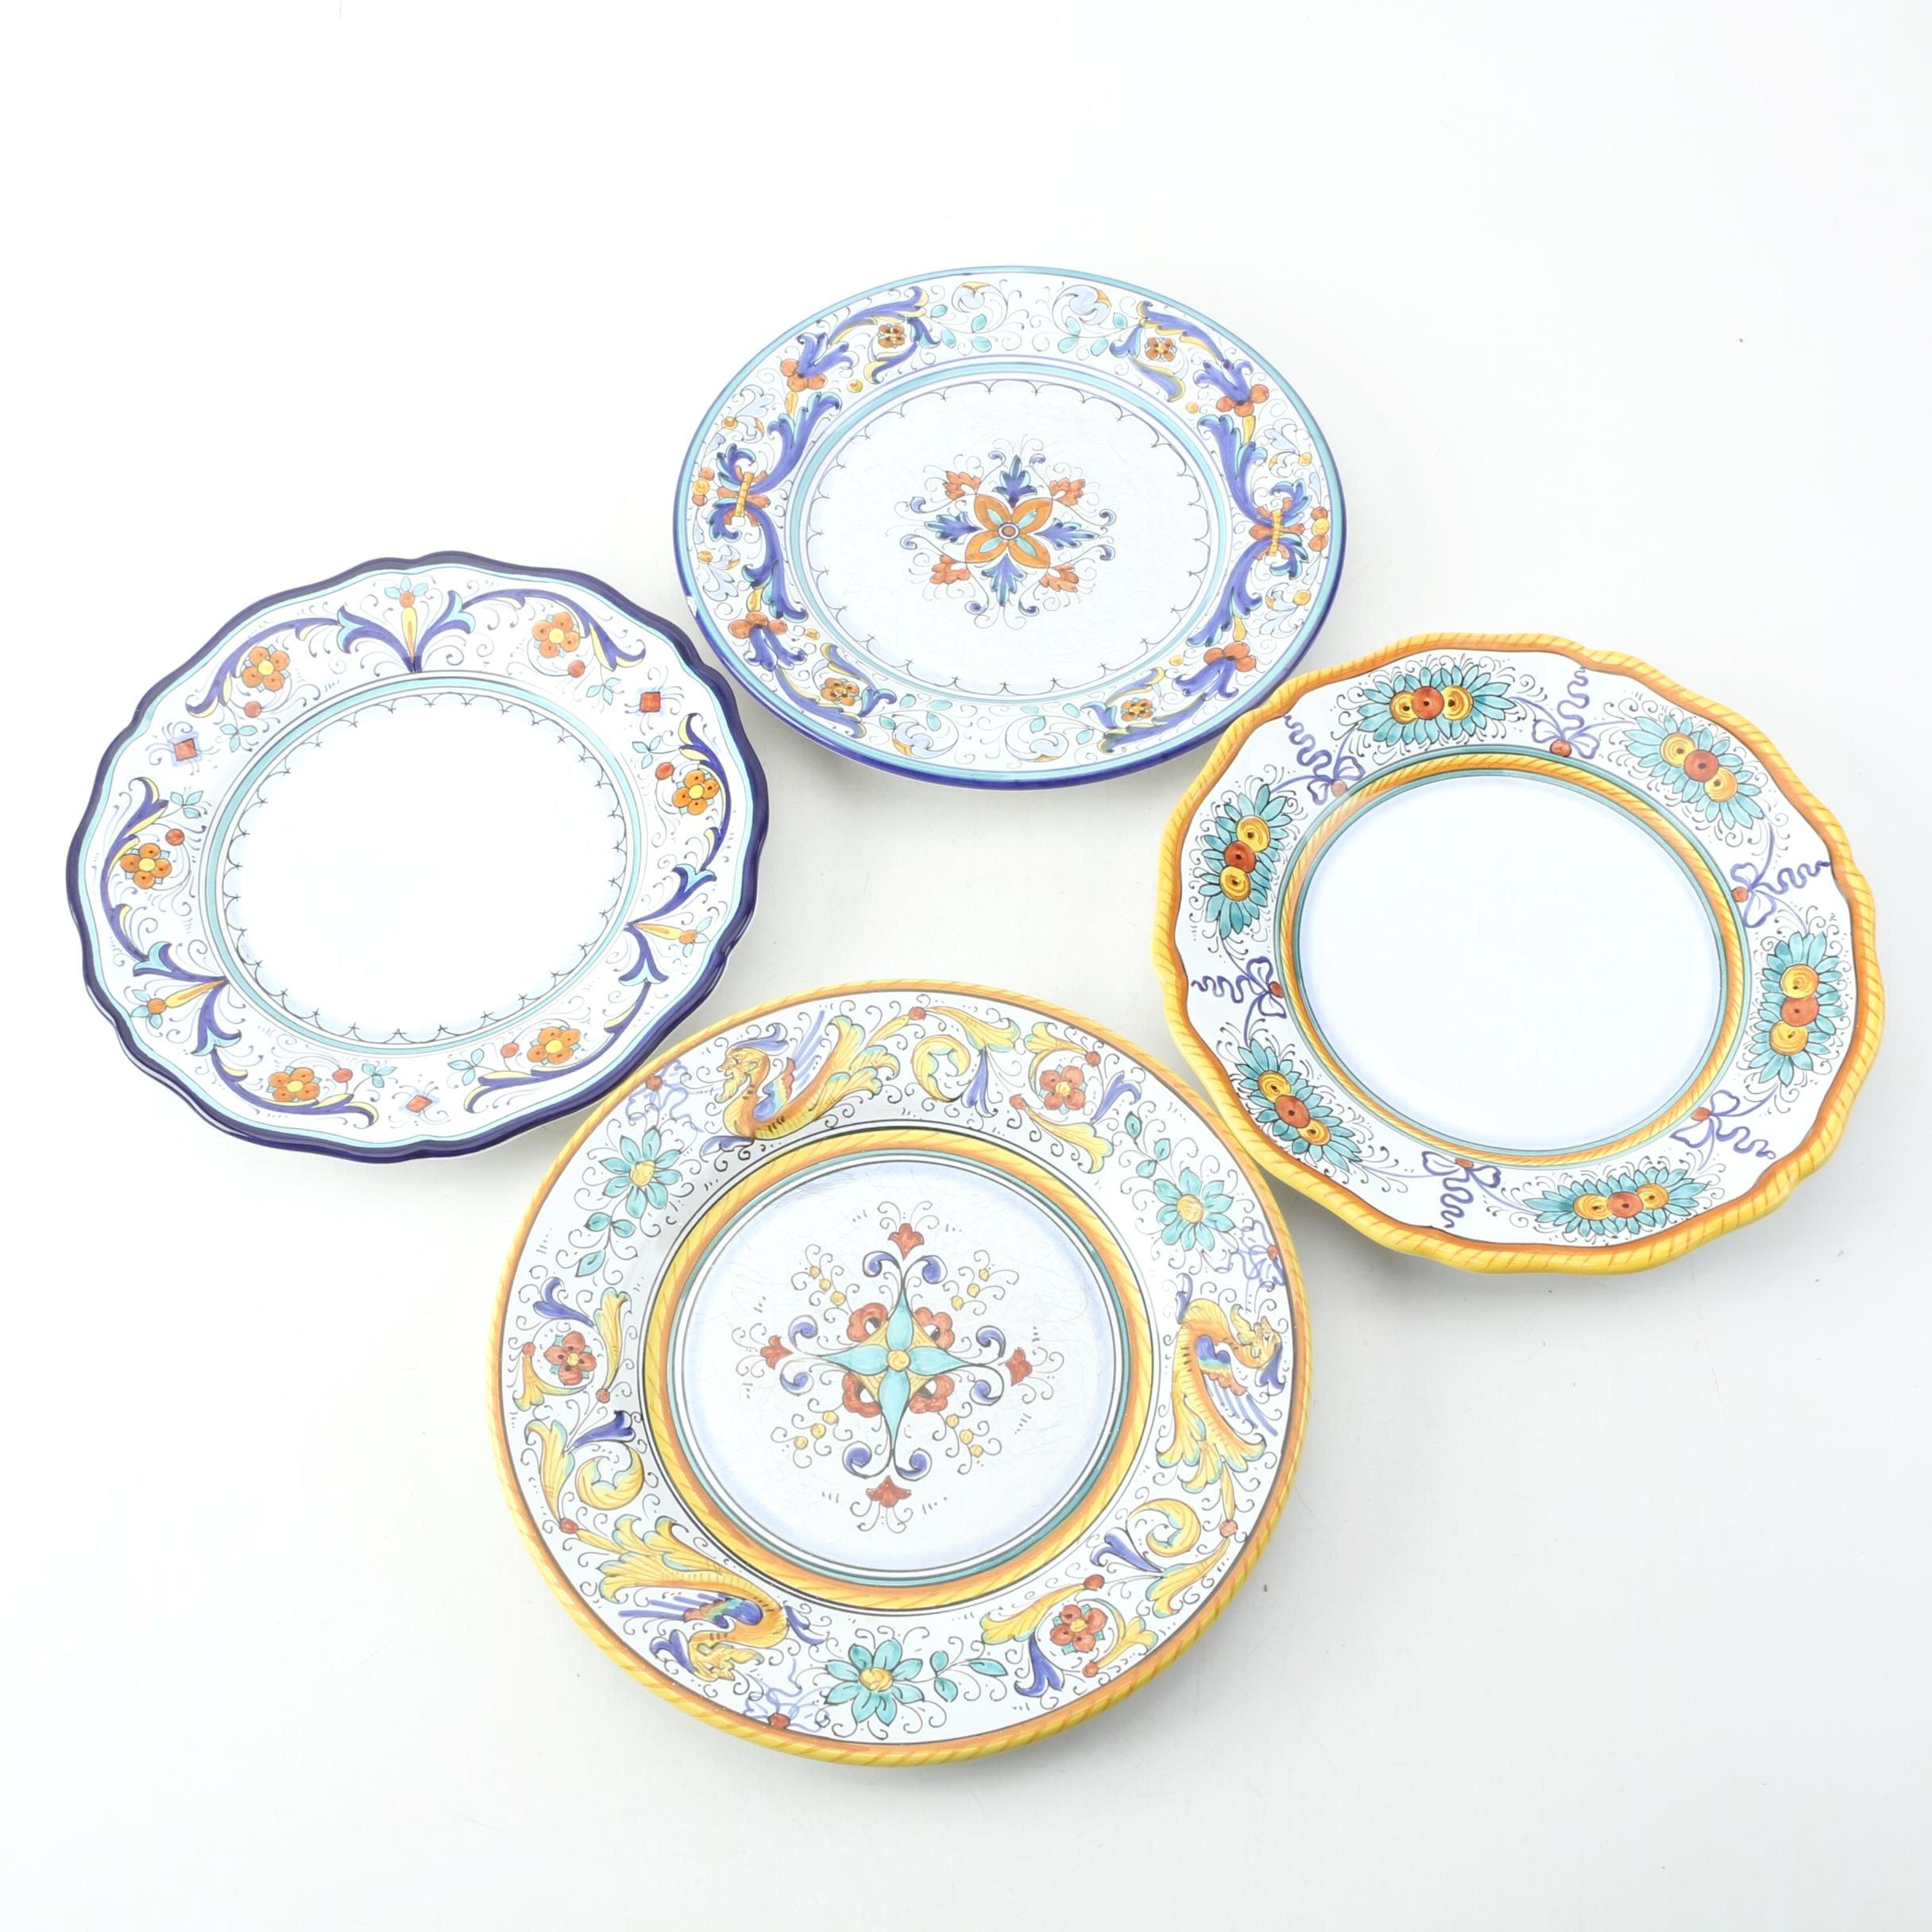 Nova Deruta Italian Hand Painted Earthenware Plates